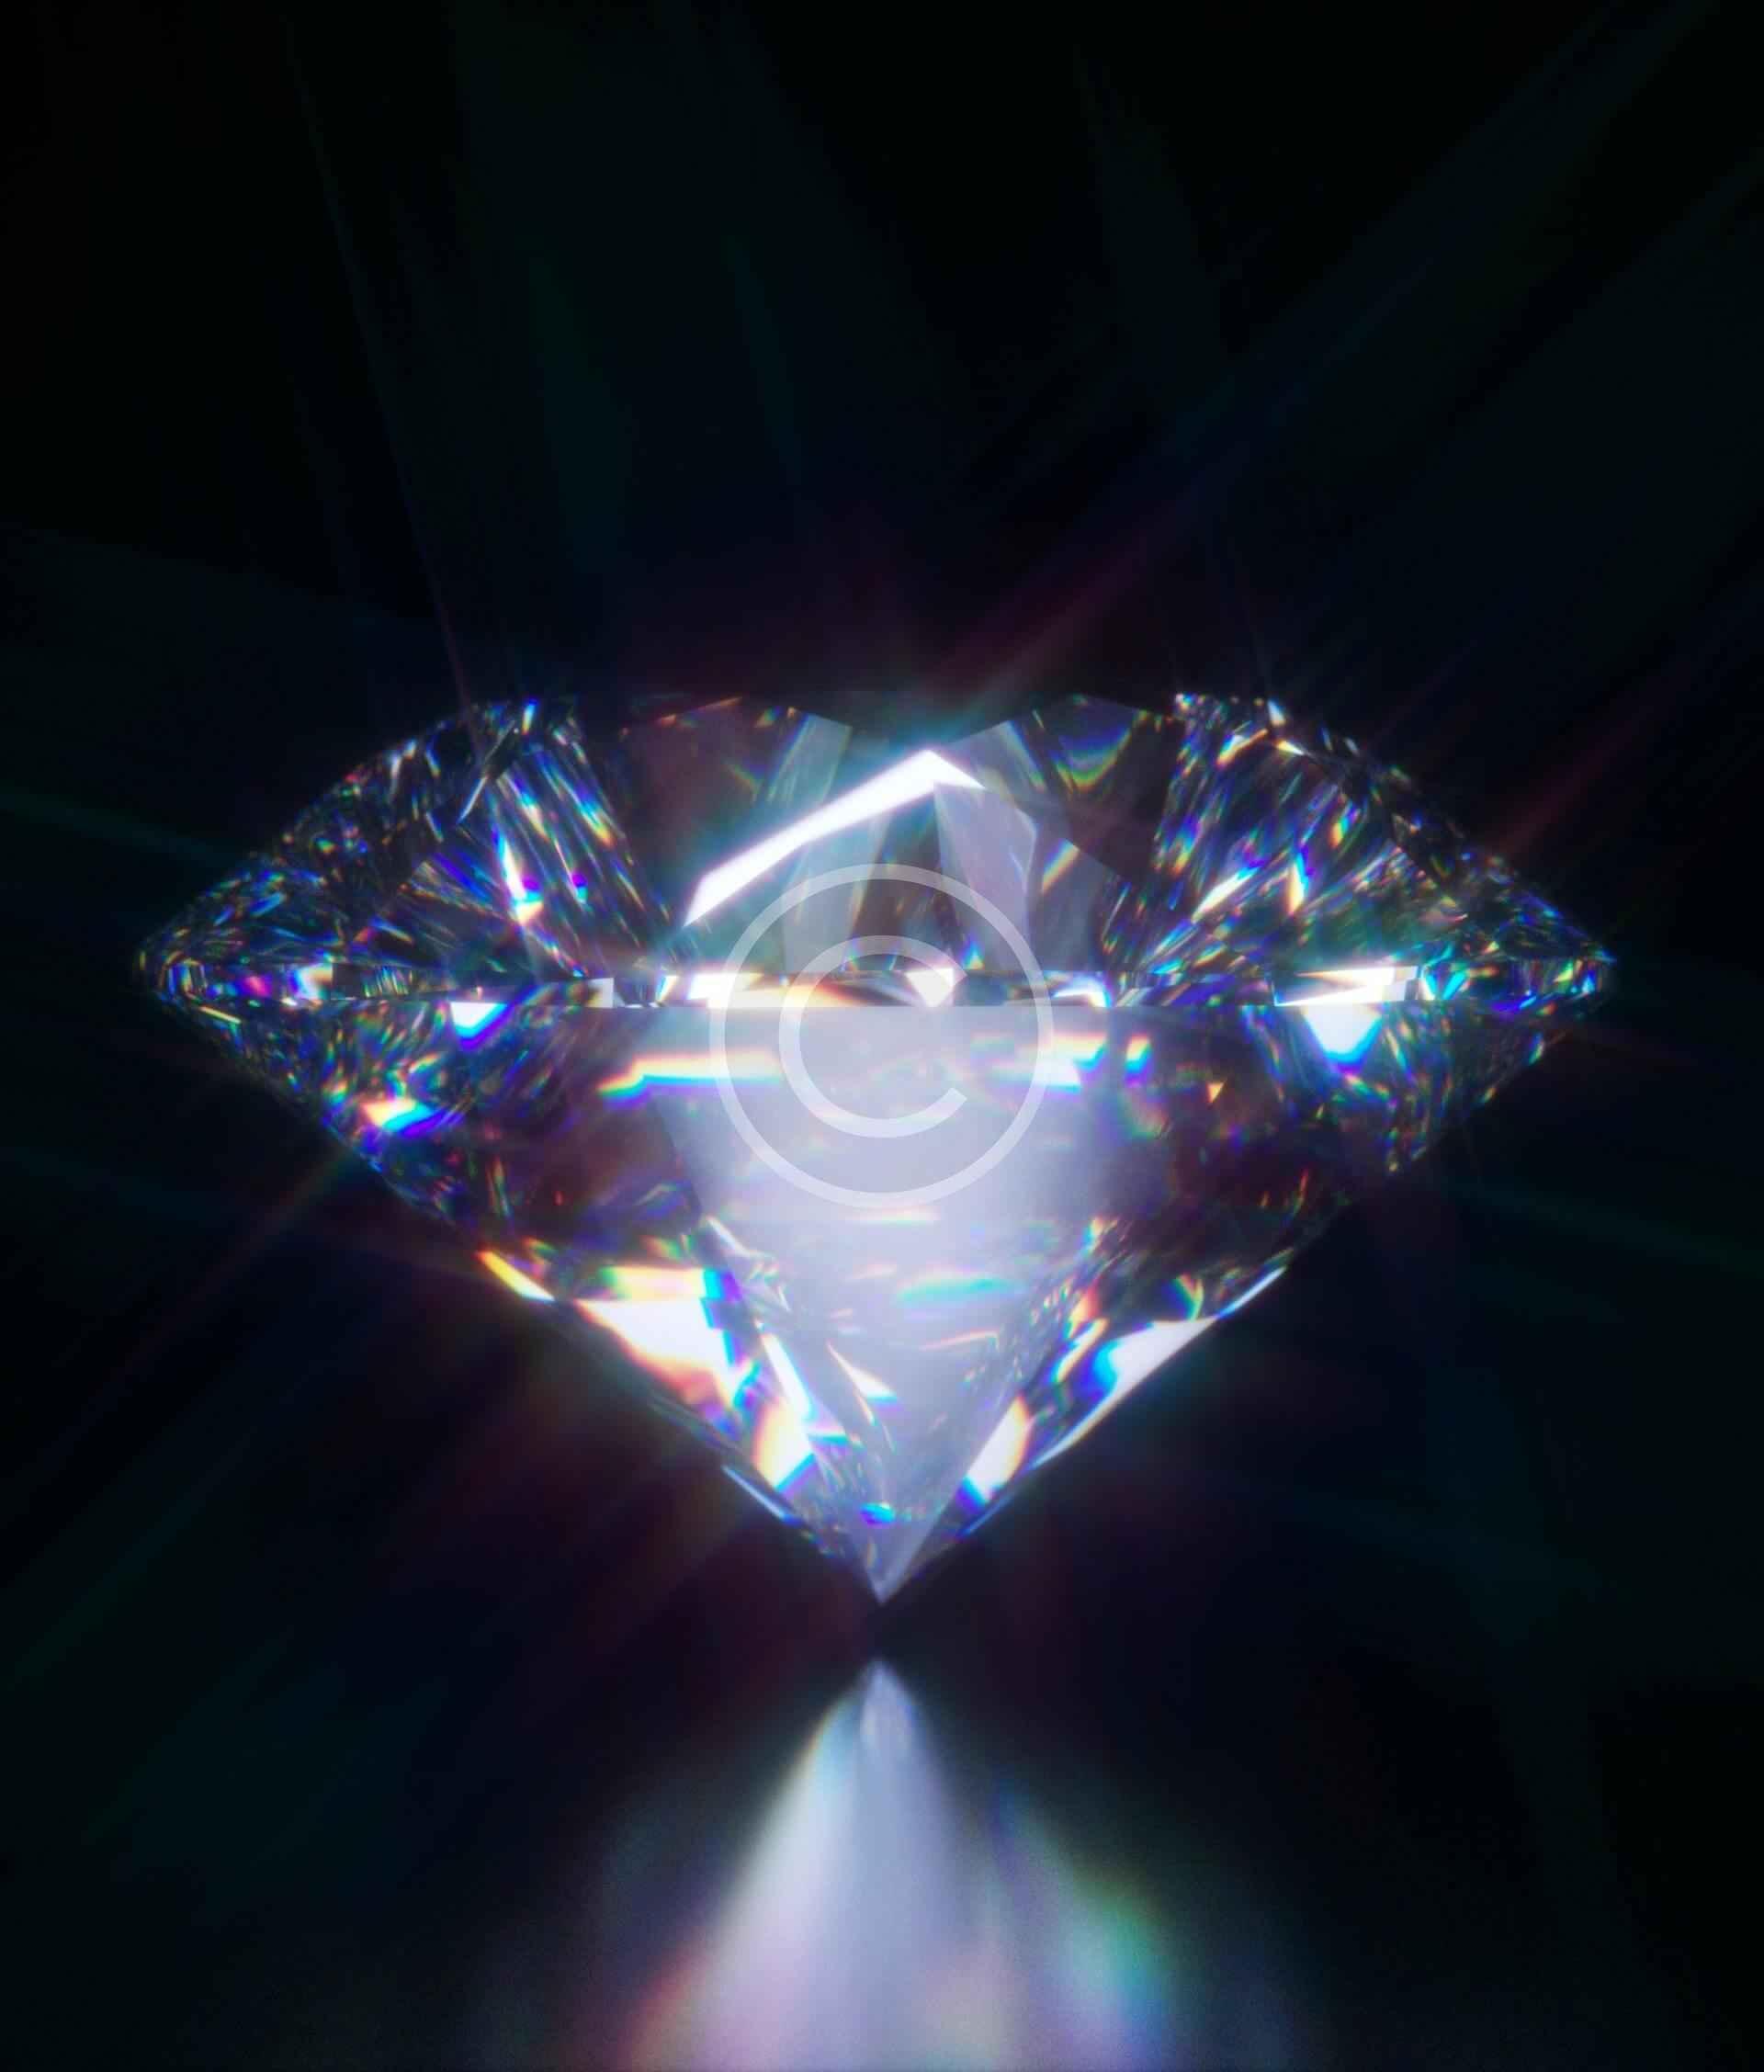 Diamonds' Life